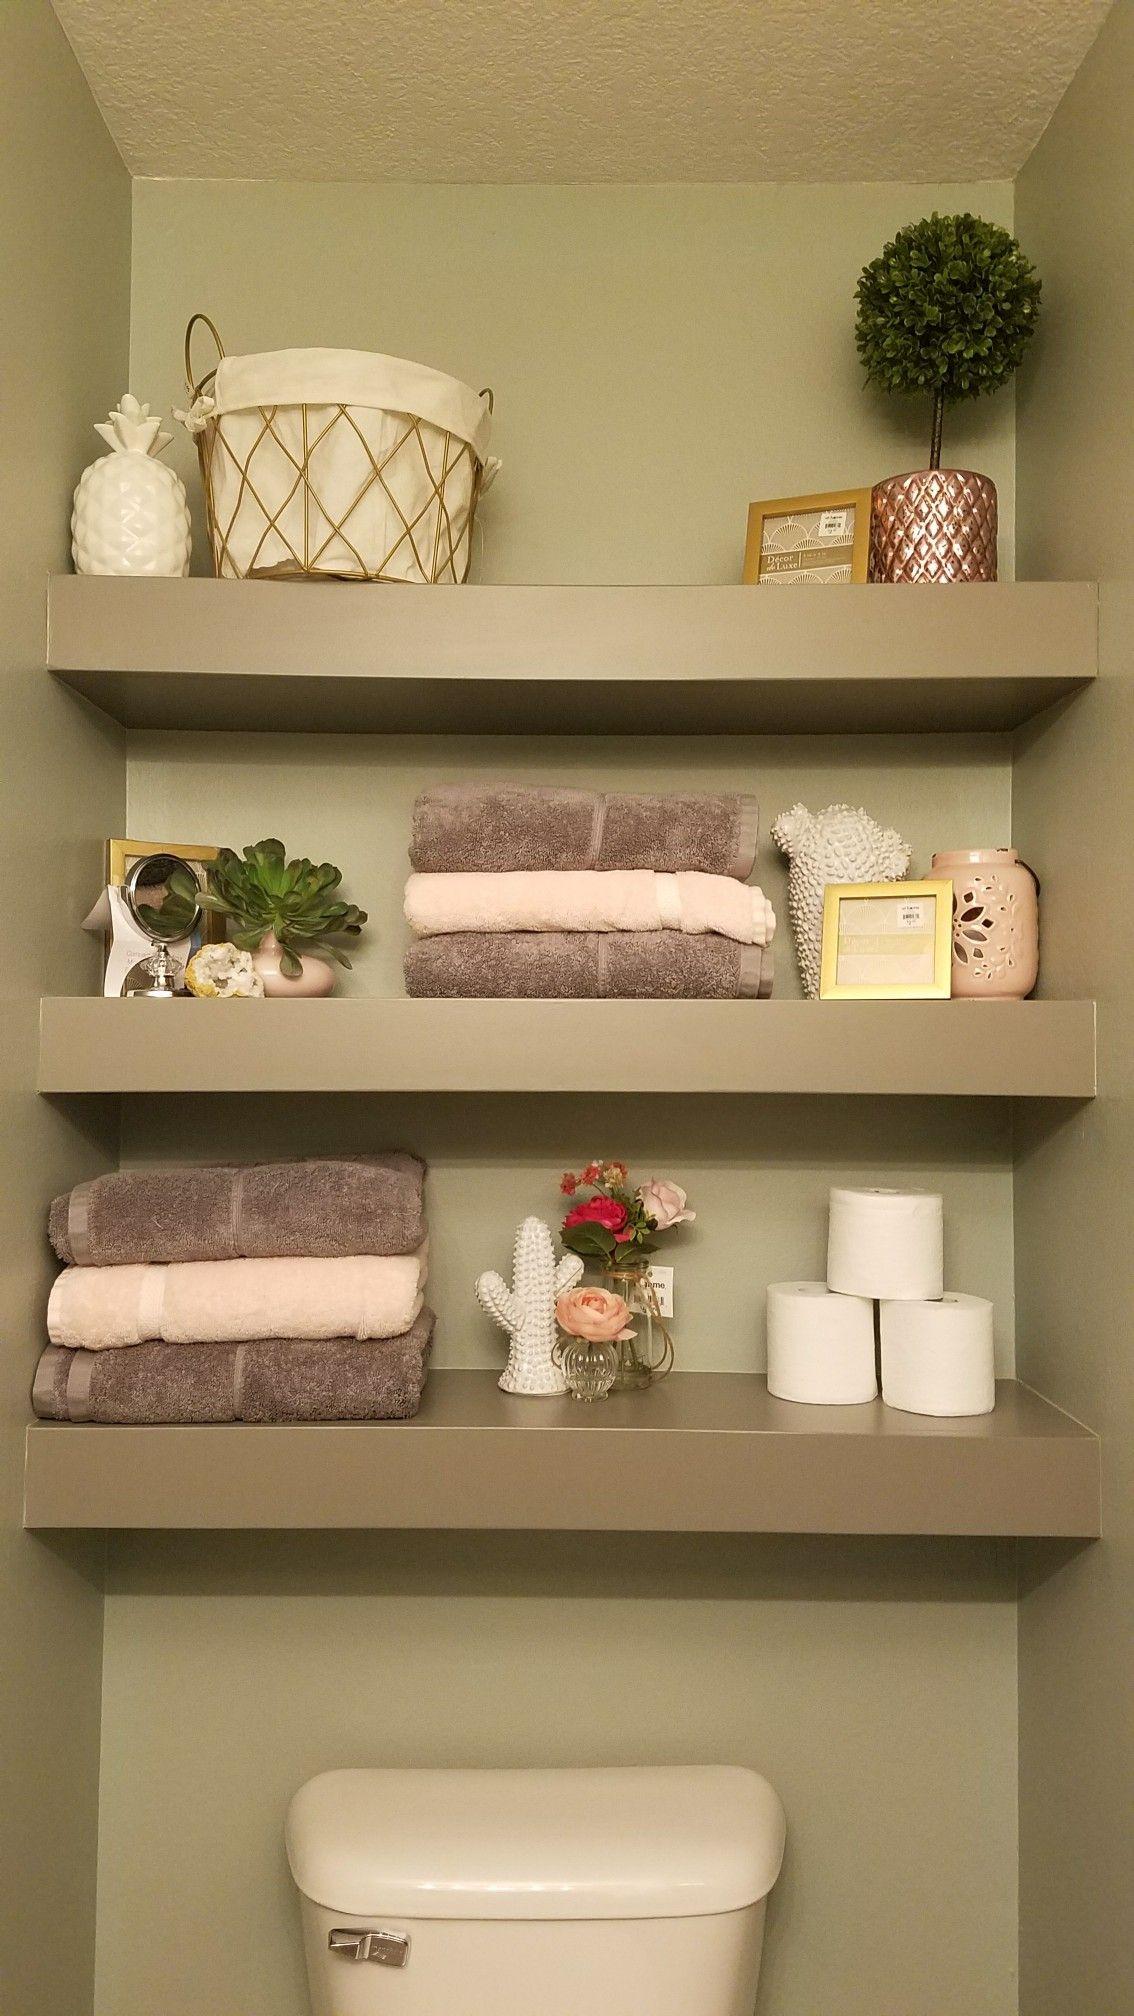 Girls Bathroom Shelves Bathroom Shelves Shelves Girls Bathroom